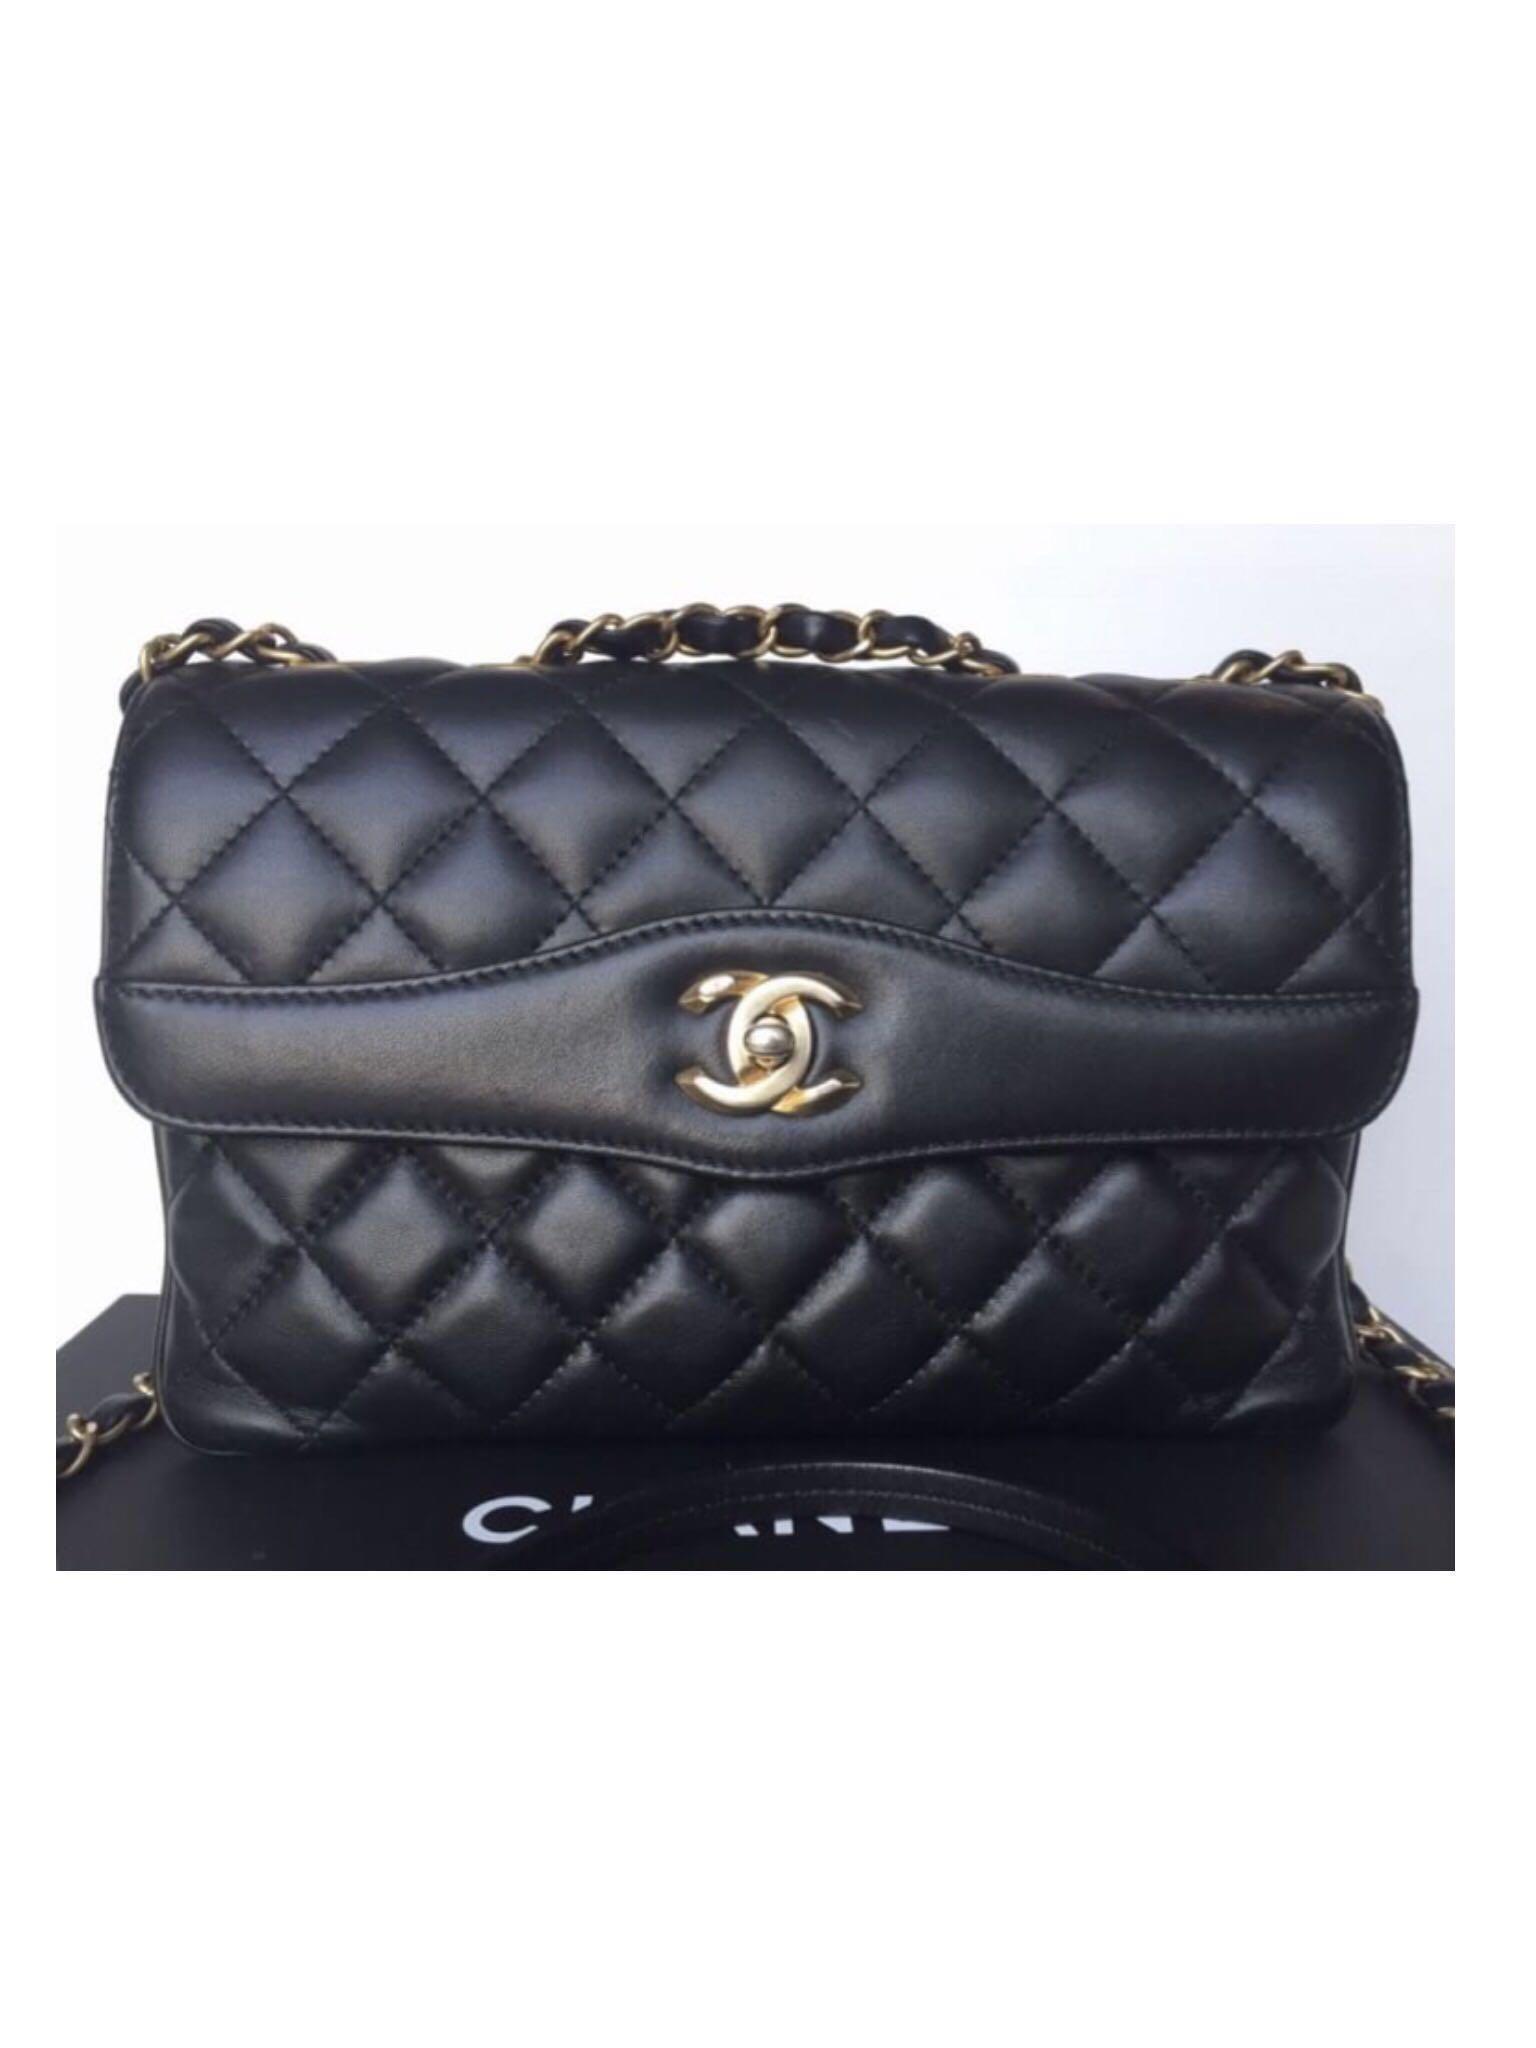 7231de1794198f 2018 Cruise - Chanel Daily Companion Medium Flap Bag, Luxury, Bags ...